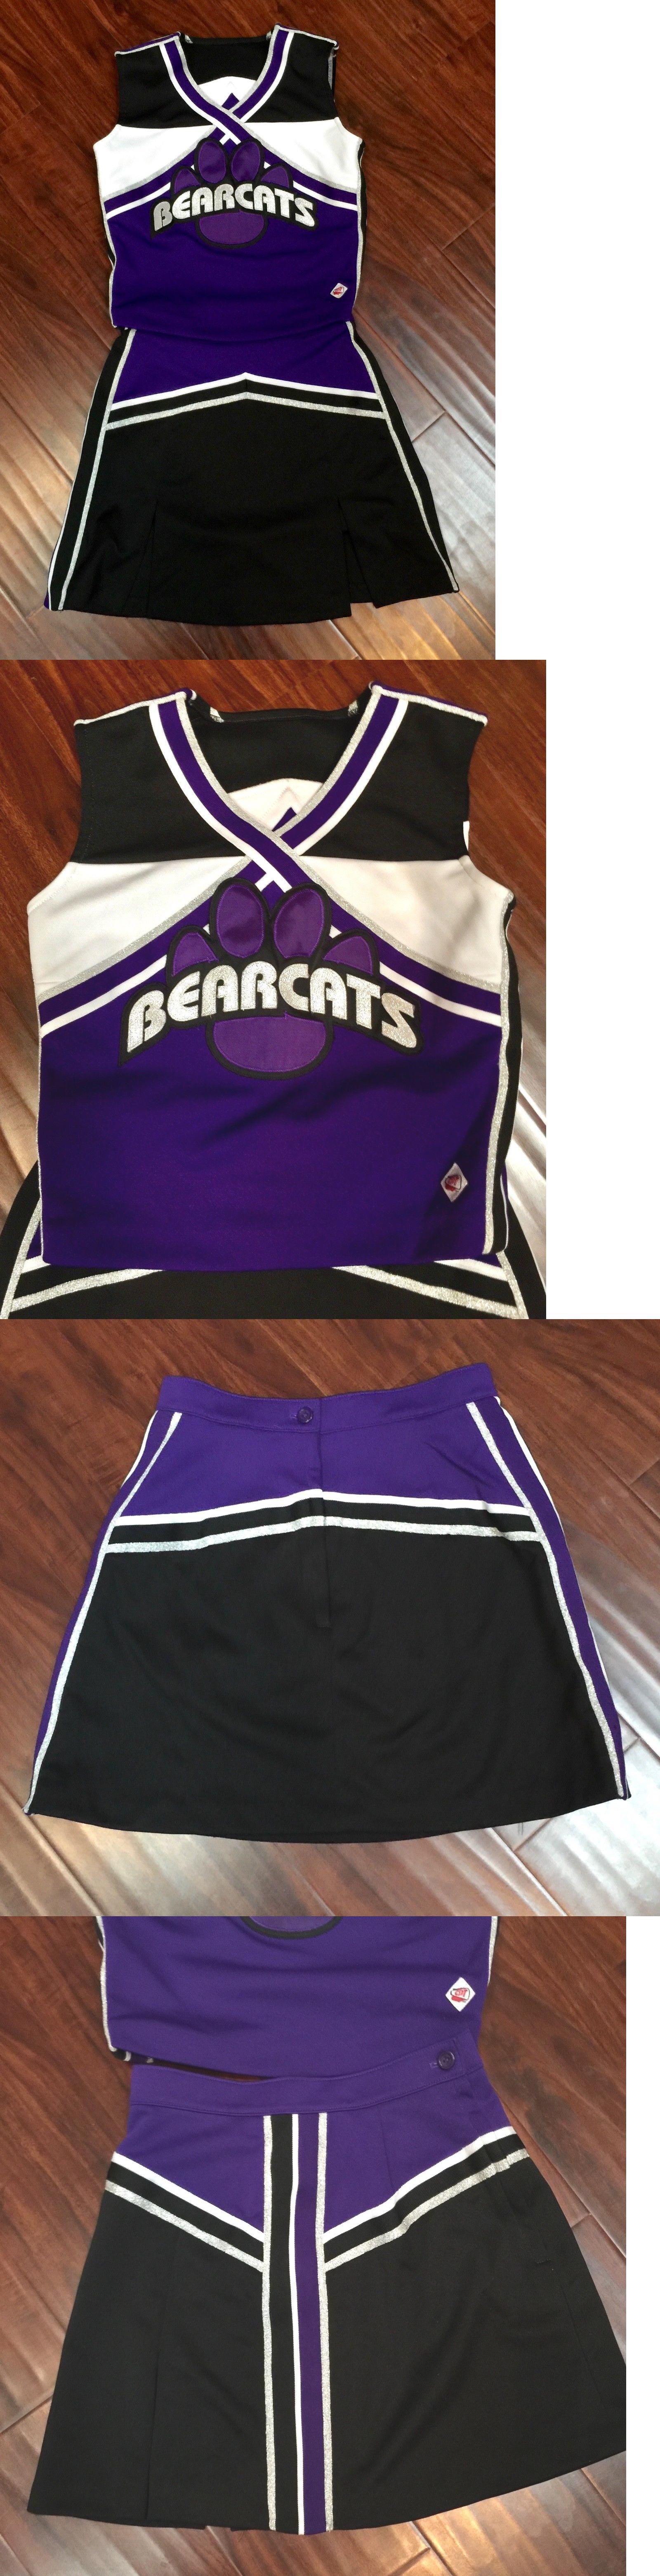 89e5f240a42 Cheerleading 66832  Varsity Cheerleader Purple Black Silver Bearcats Cheerleading  Uniform 32 24 -  BUY